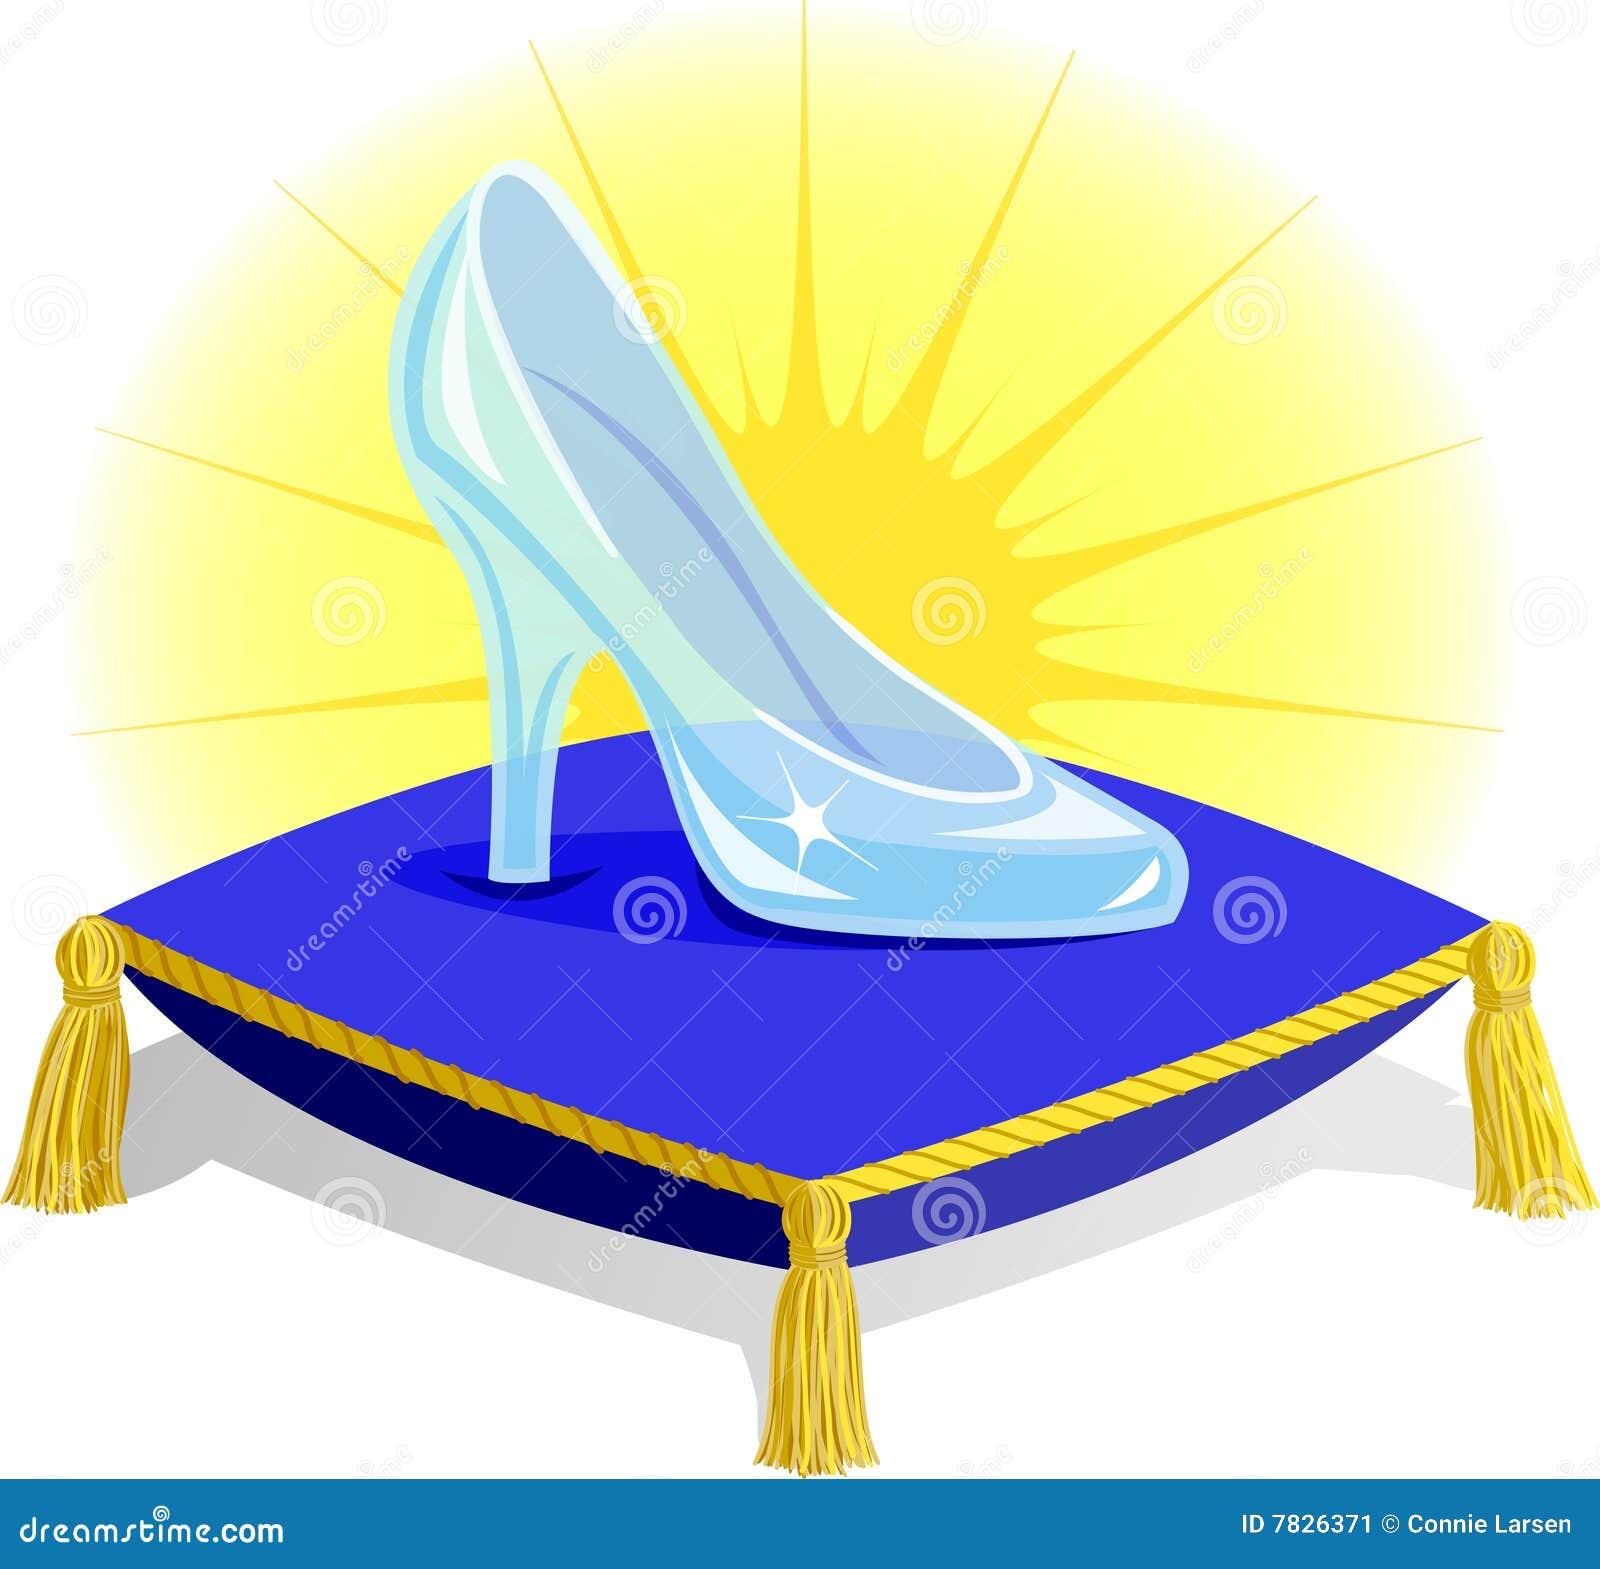 Cinderellas Glass Slipper Glass Slipper on Pilloweps